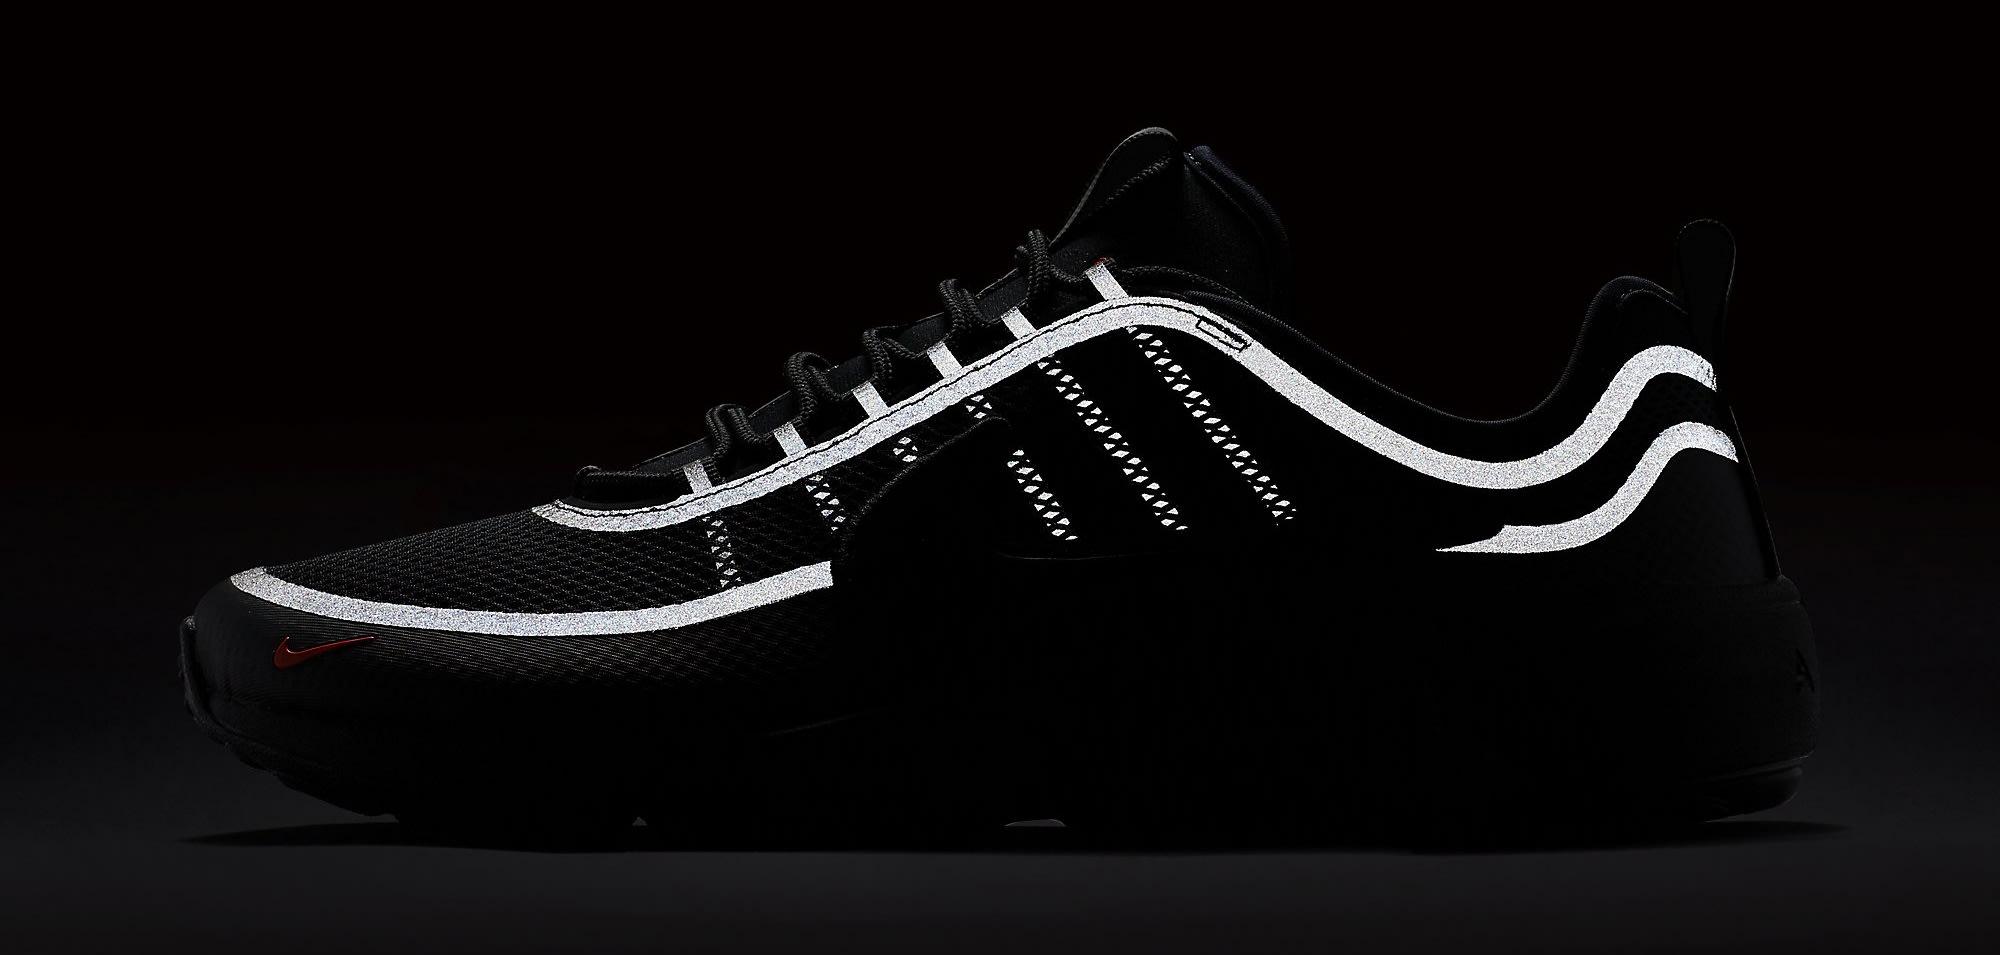 Nike Zoom Spiridon Ultra Black 876267-002 Reflective